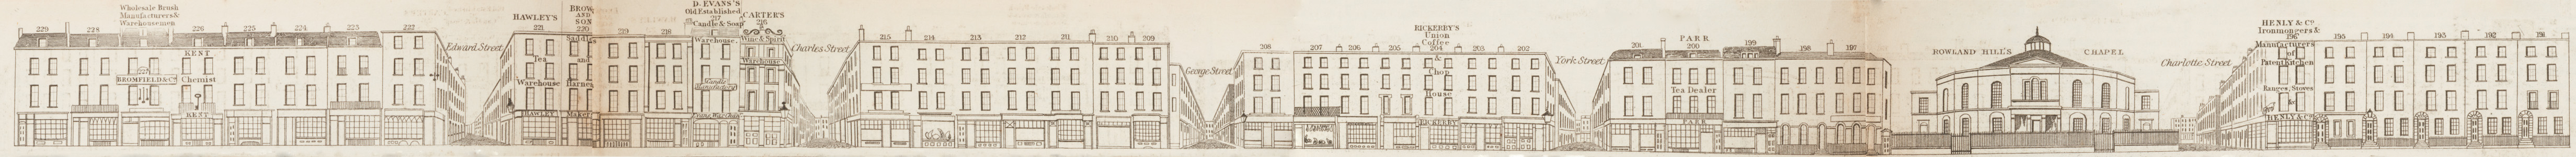 map - Tallis's London street views : No. 58. Blackfriars Road, division 2 (east)